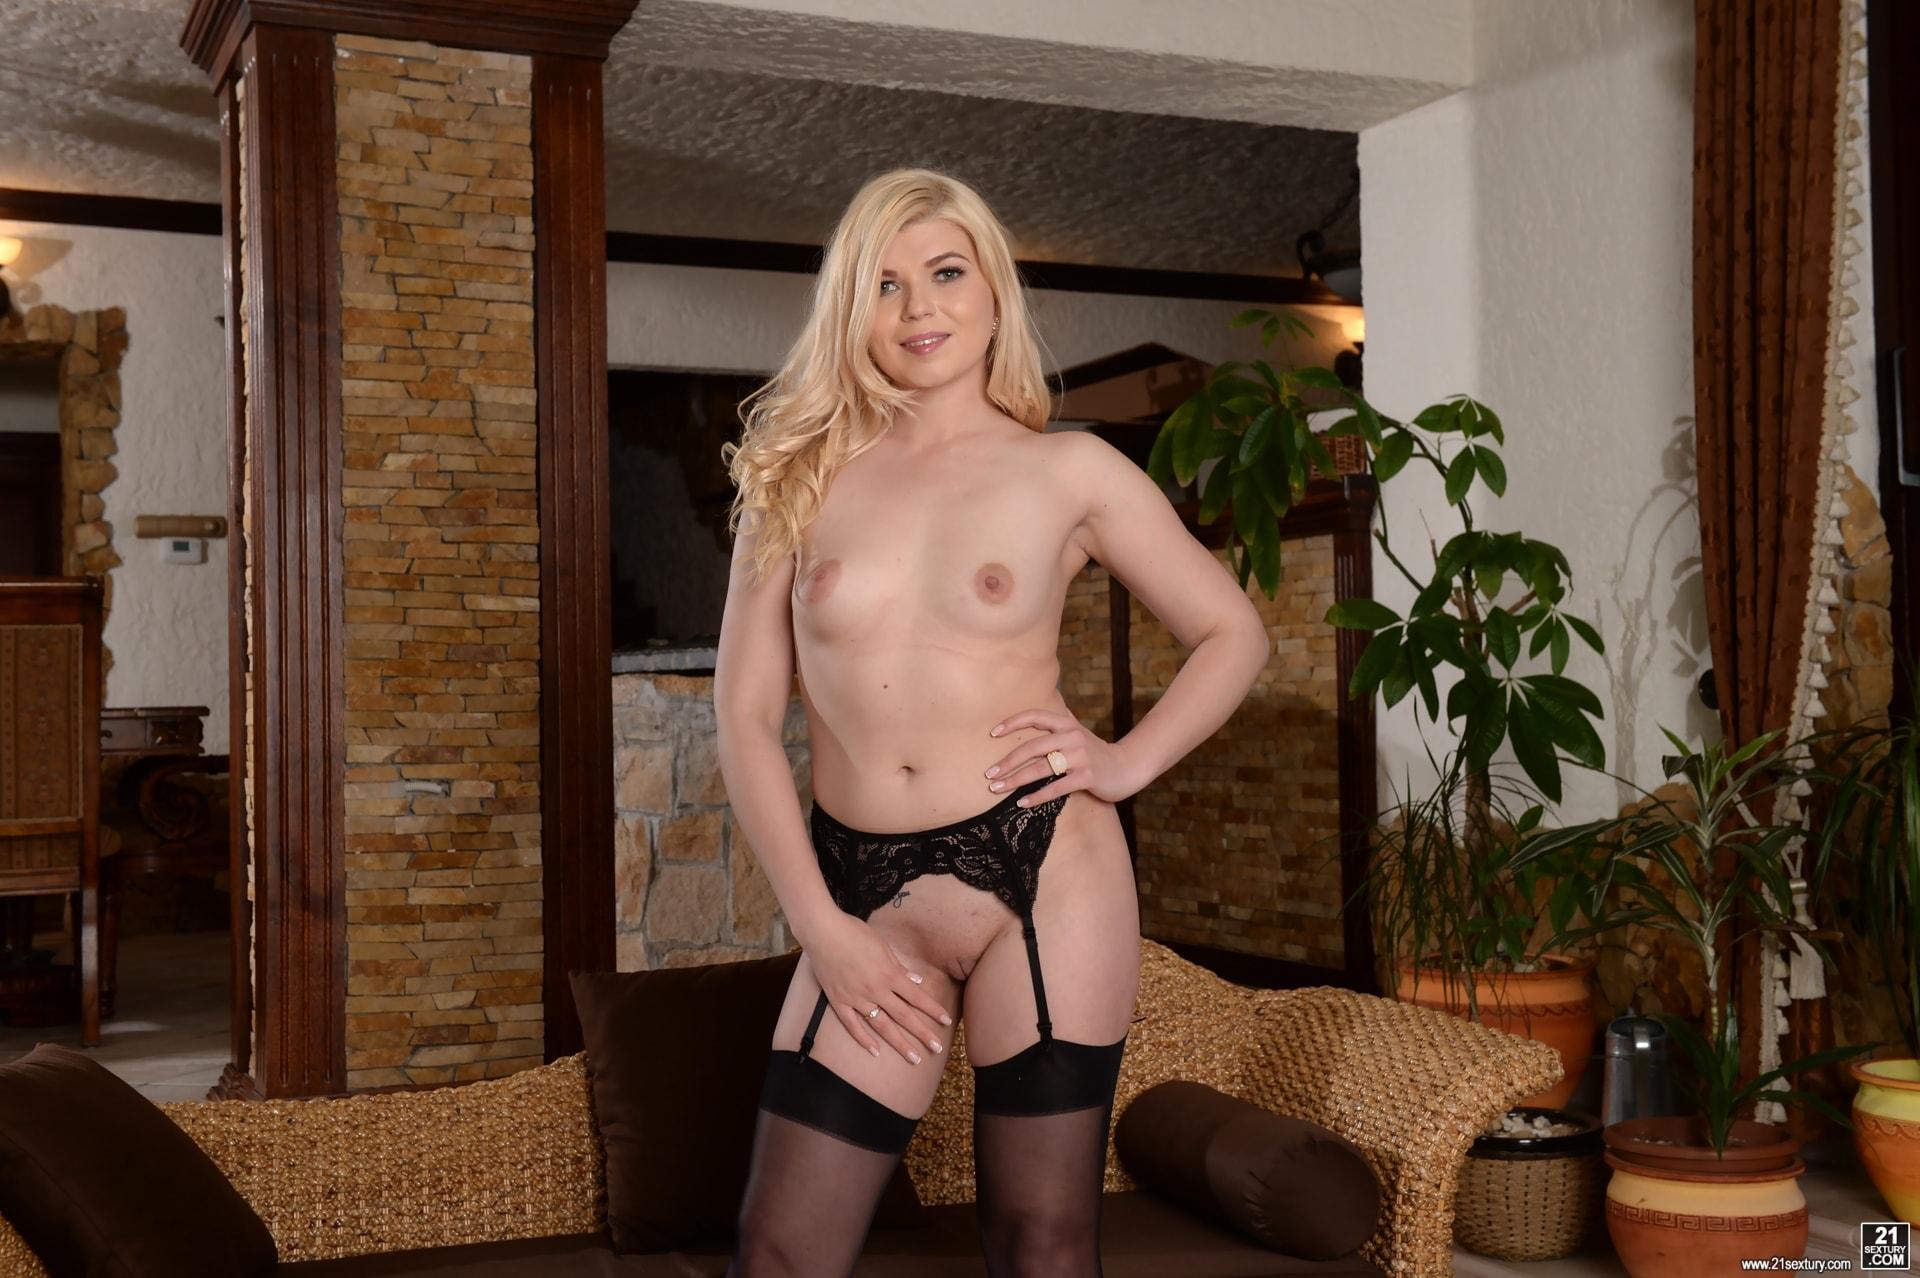 21Sextury 'Real Estate DP' starring Masha Ray (Photo 44)